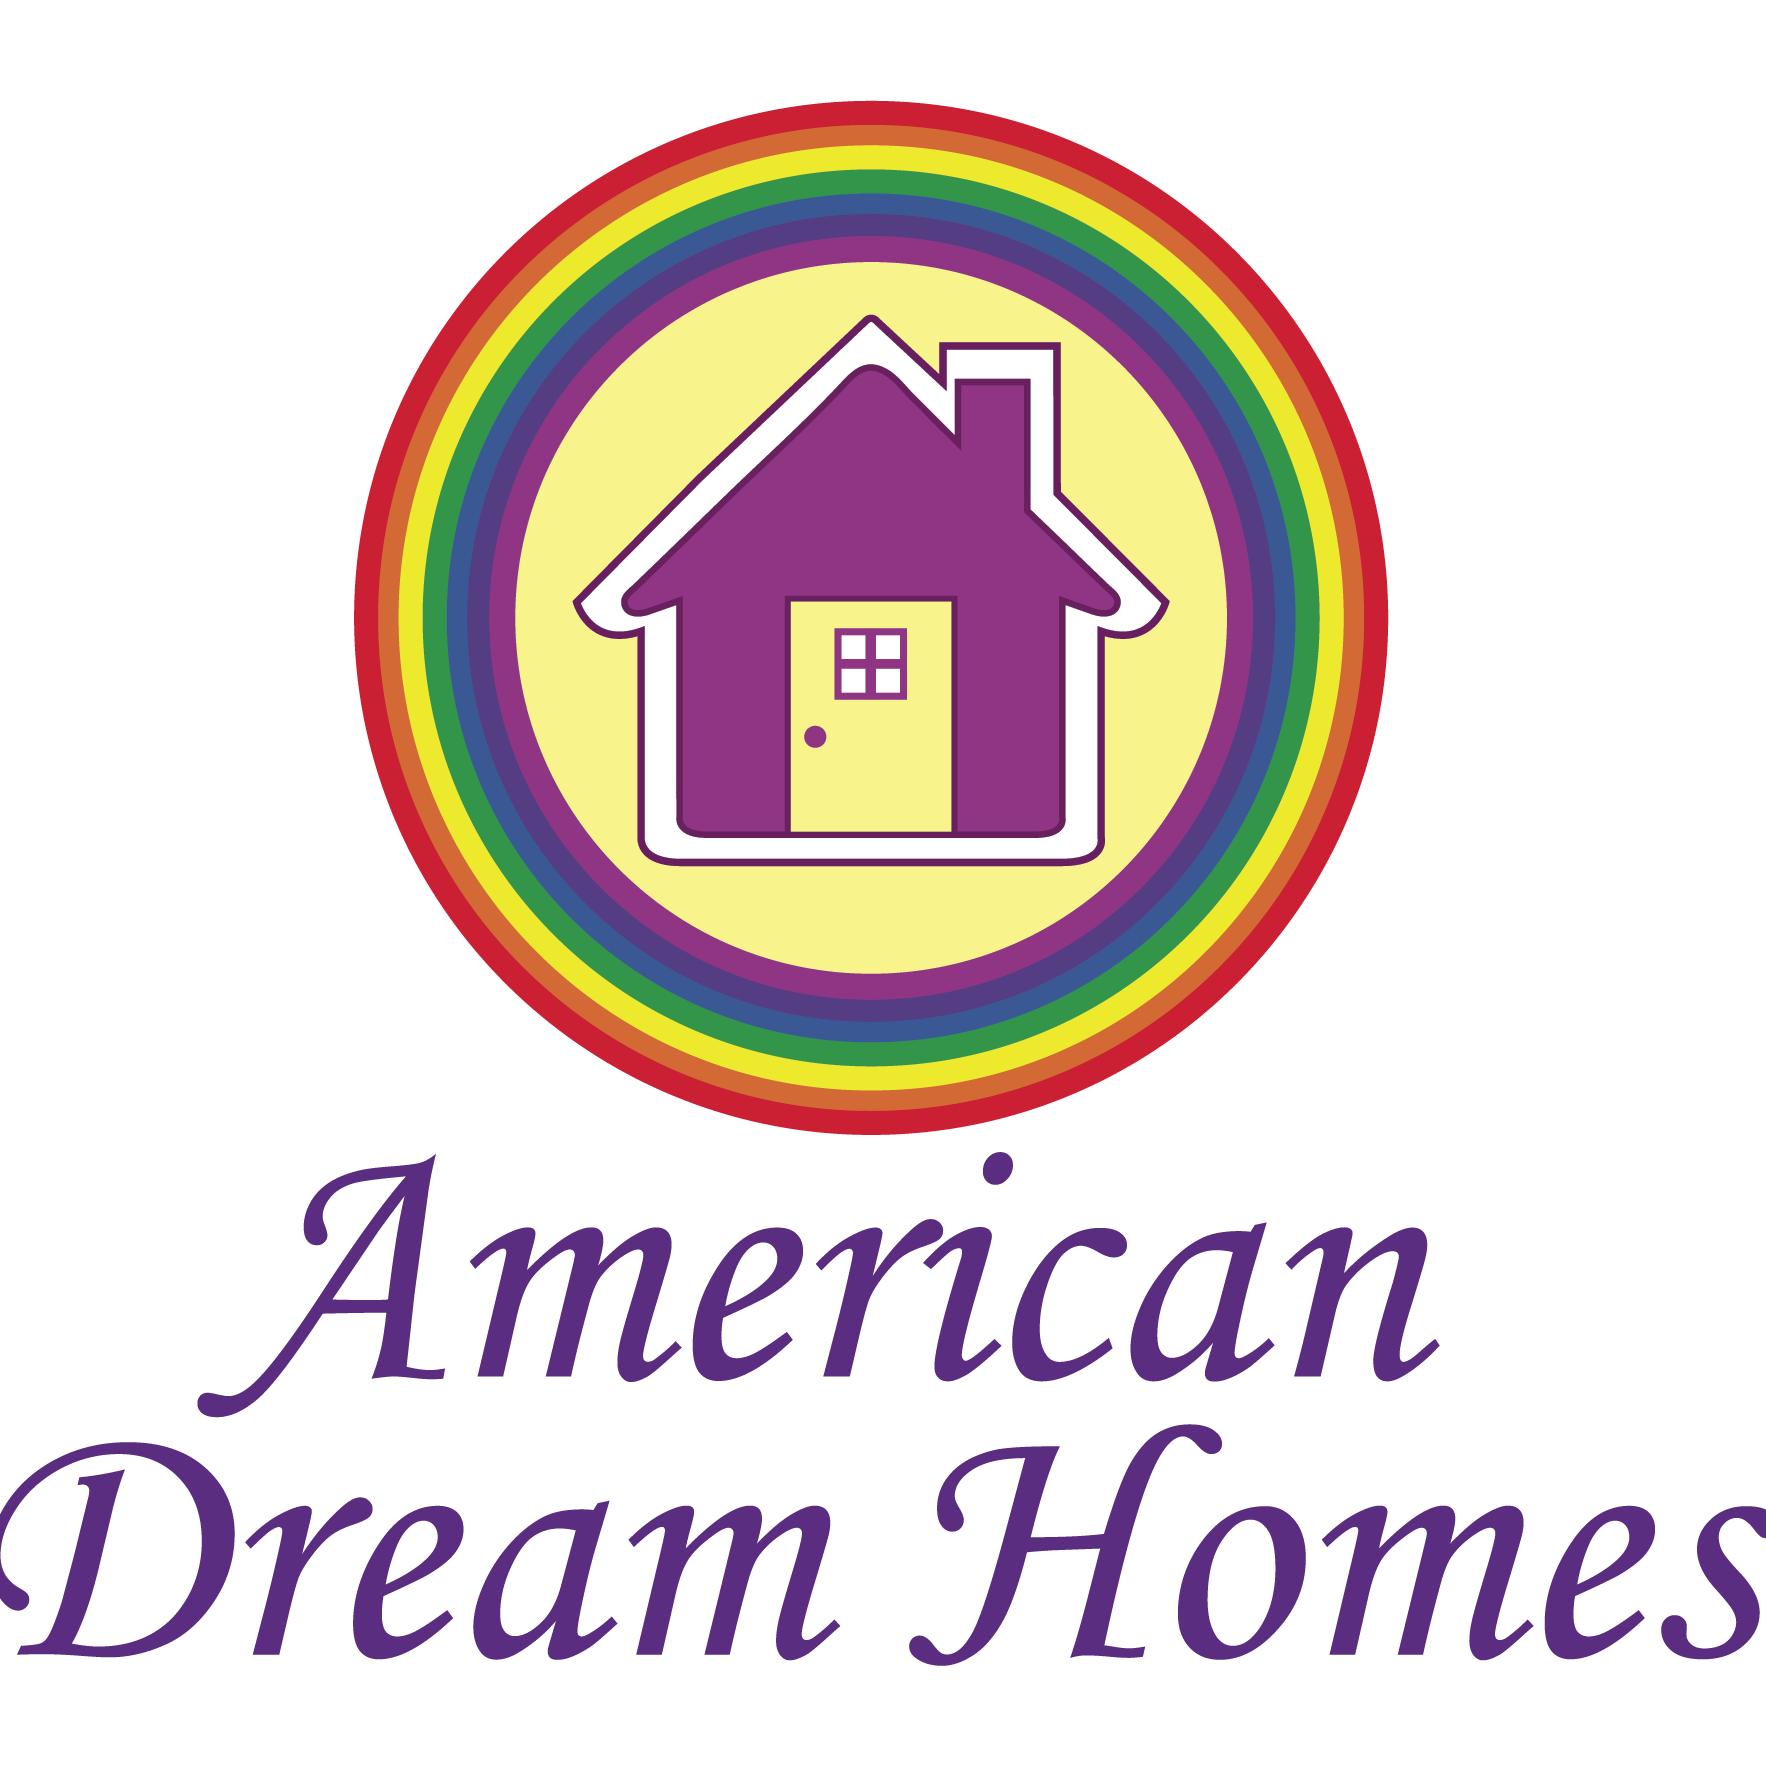 American Dream Homes, Inc